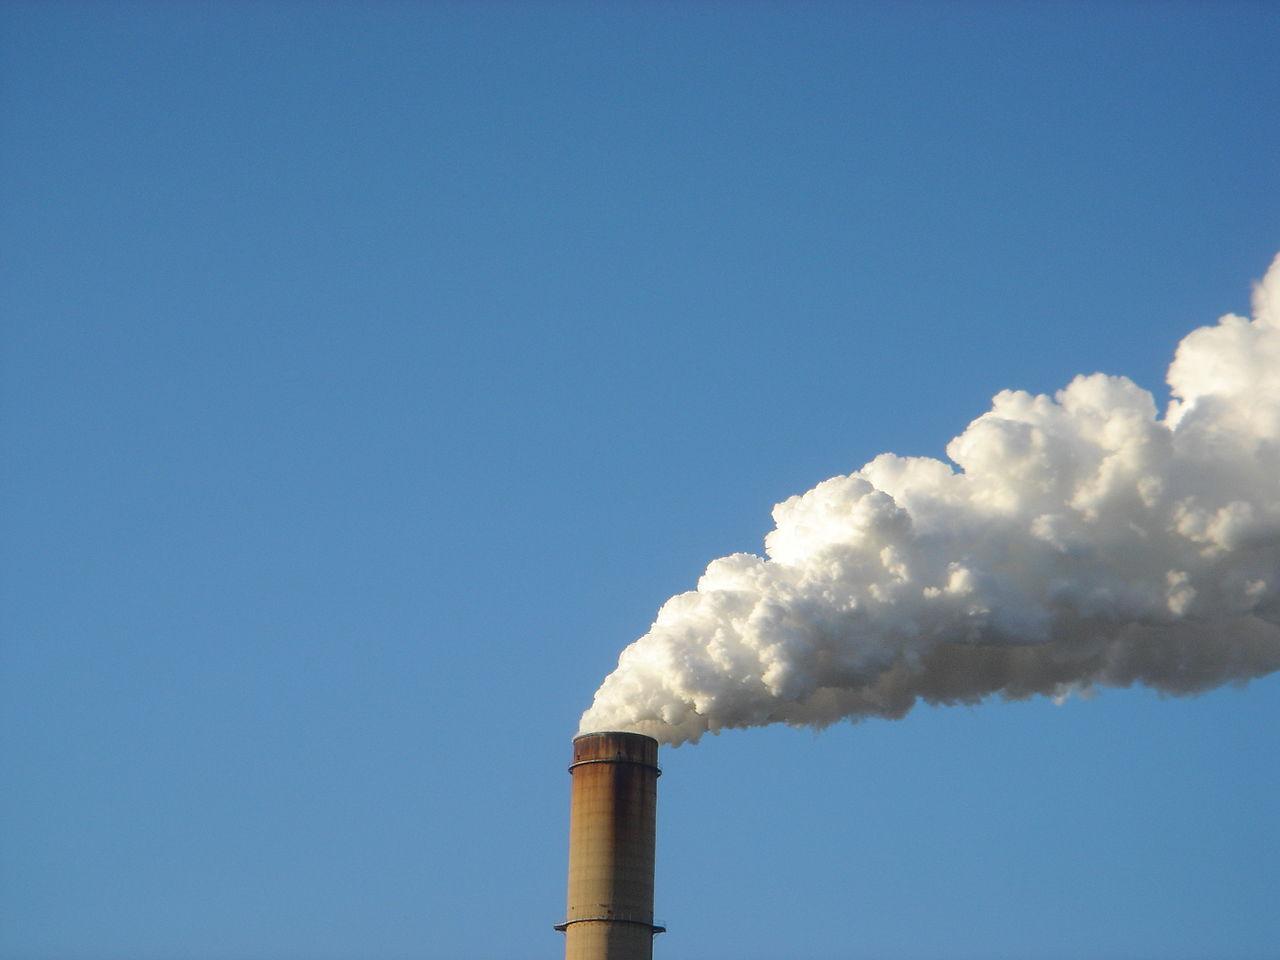 Zimmer_Power_Plant_Smoke_Stack